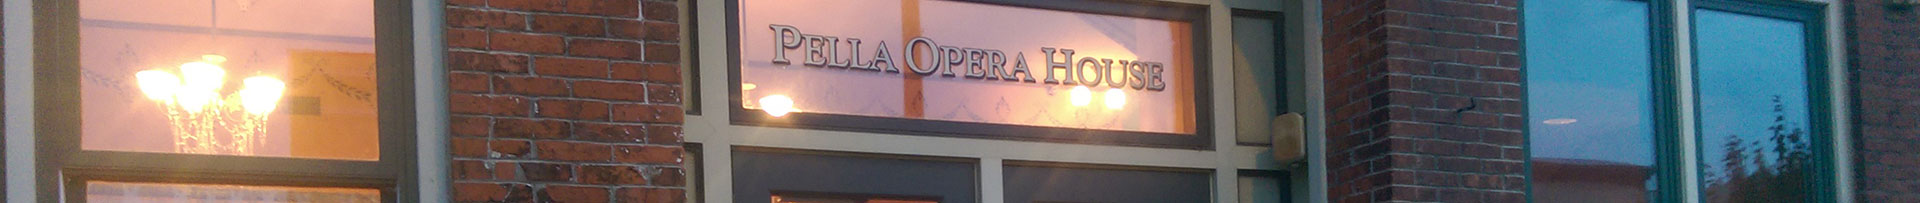 Pella Opera House